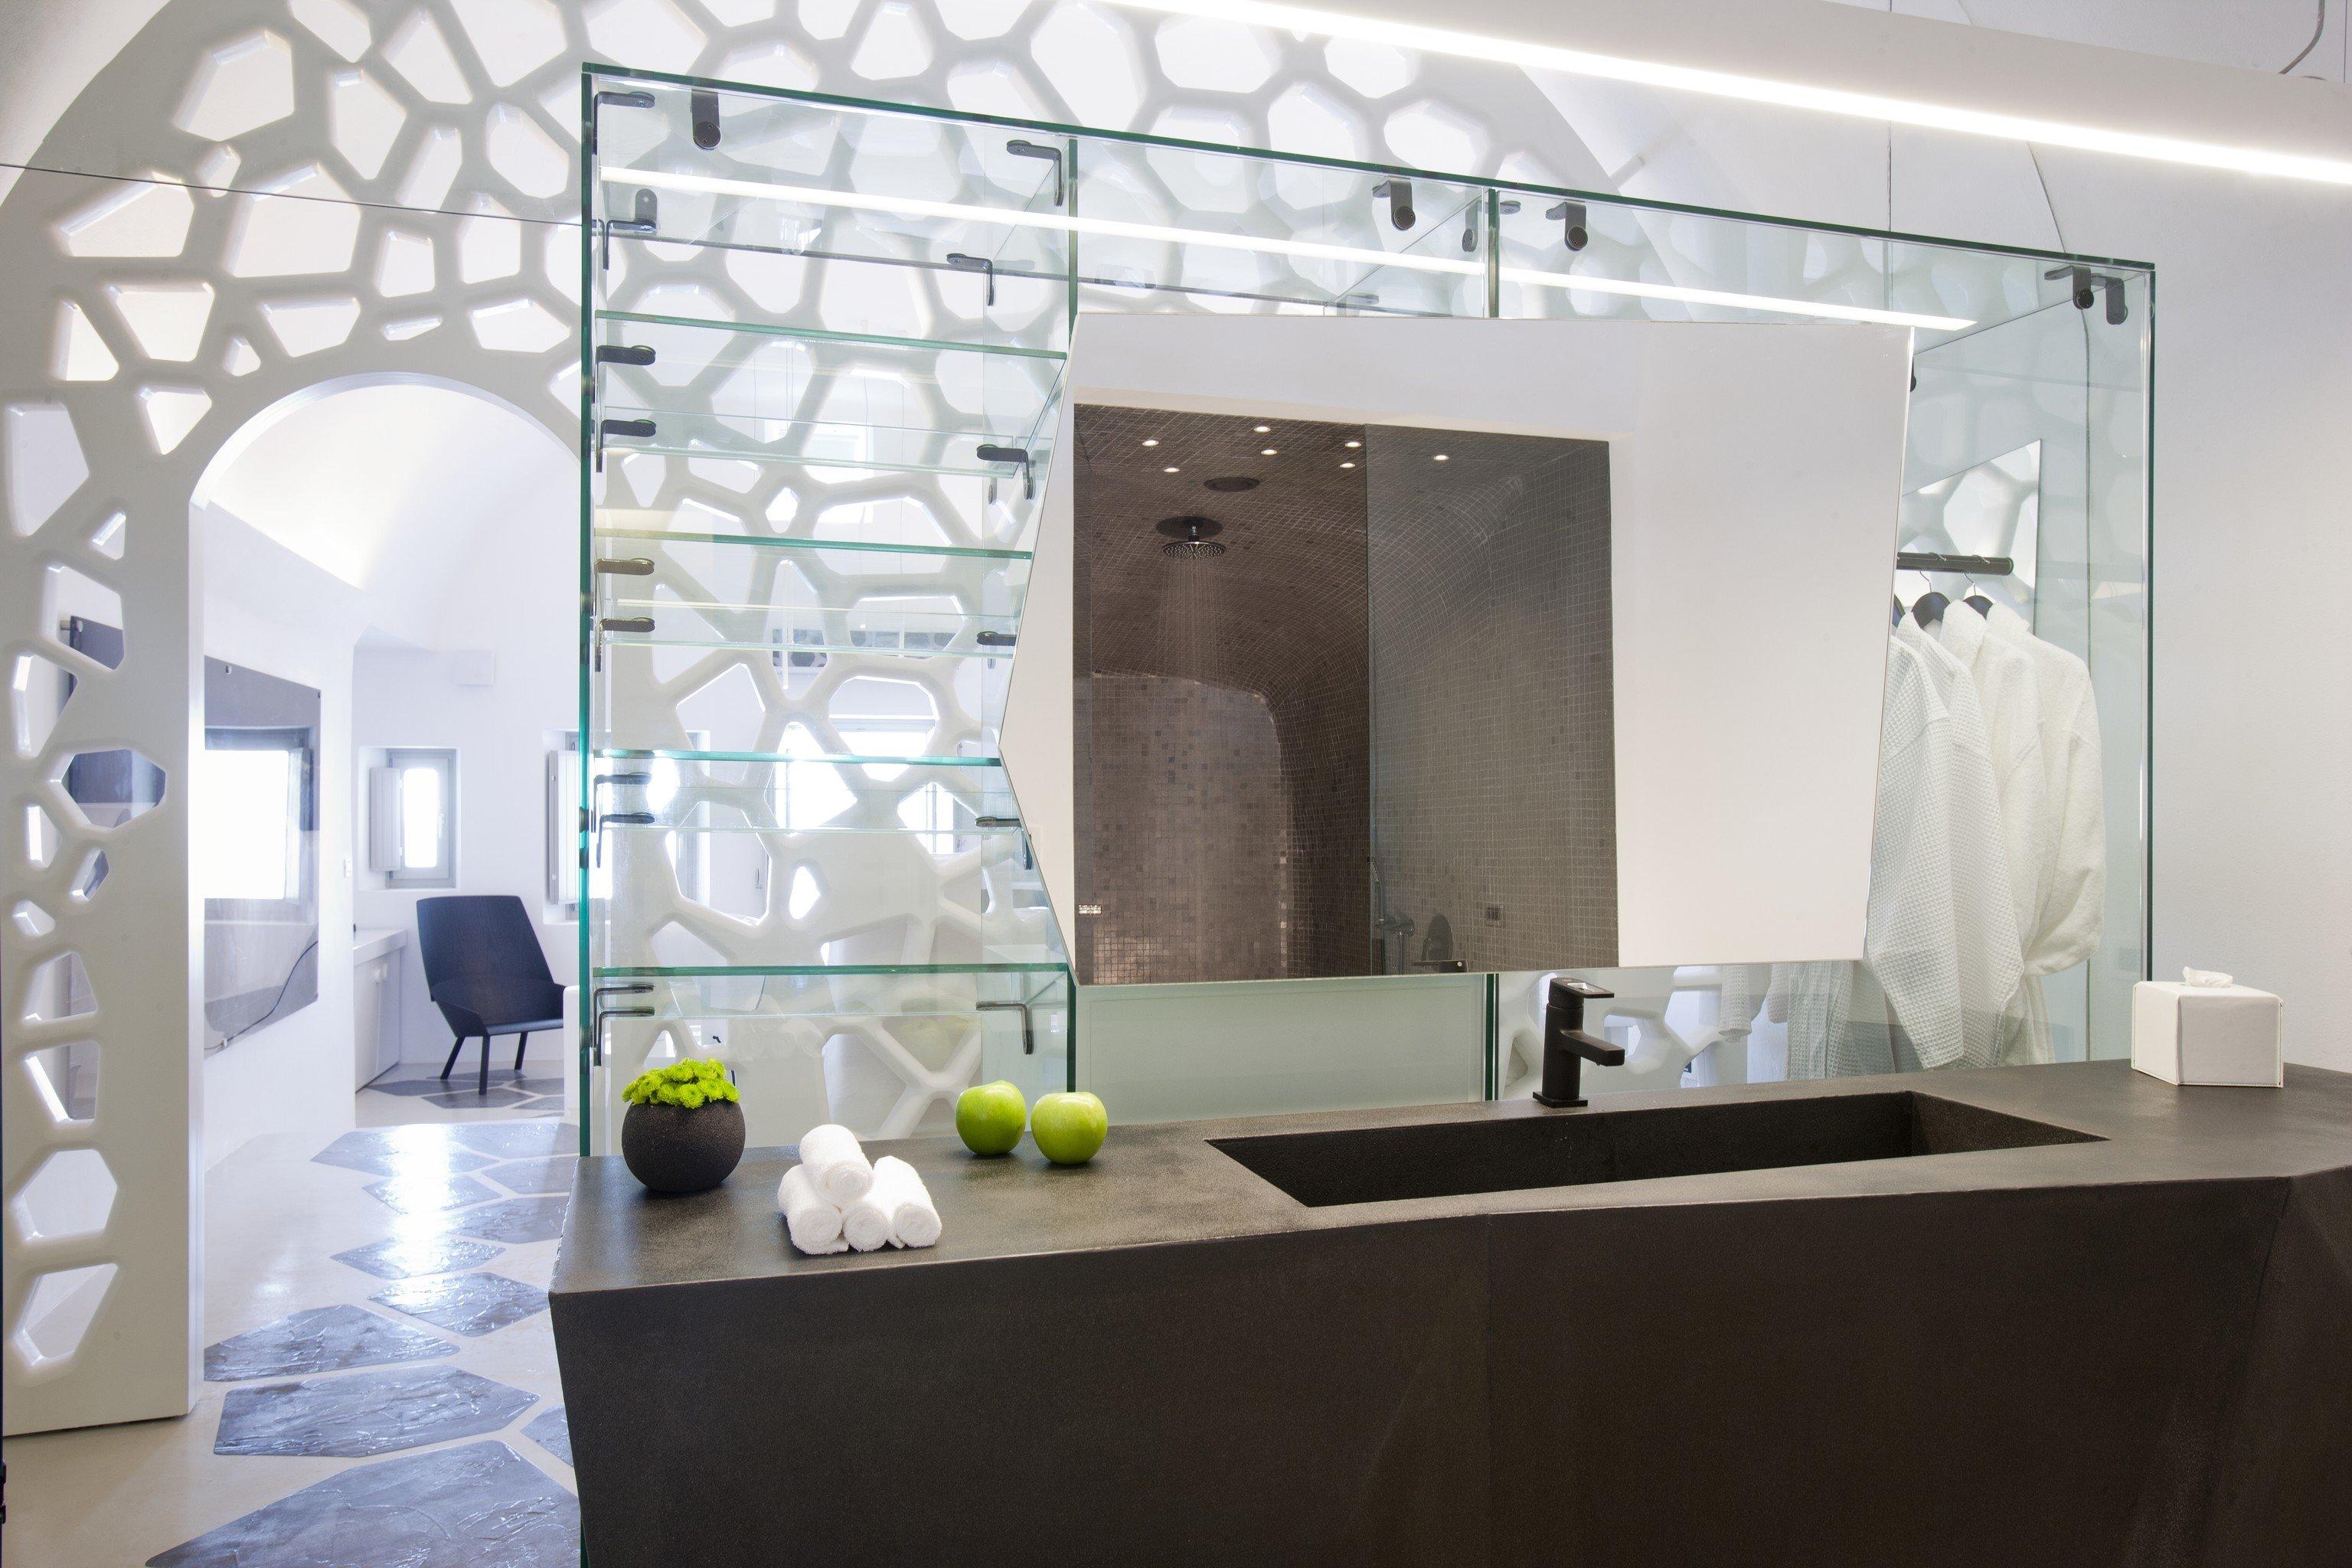 Greece Hotels Luxury Travel Santorini indoor interior design wall ceiling floor glass flooring interior designer loft table living room